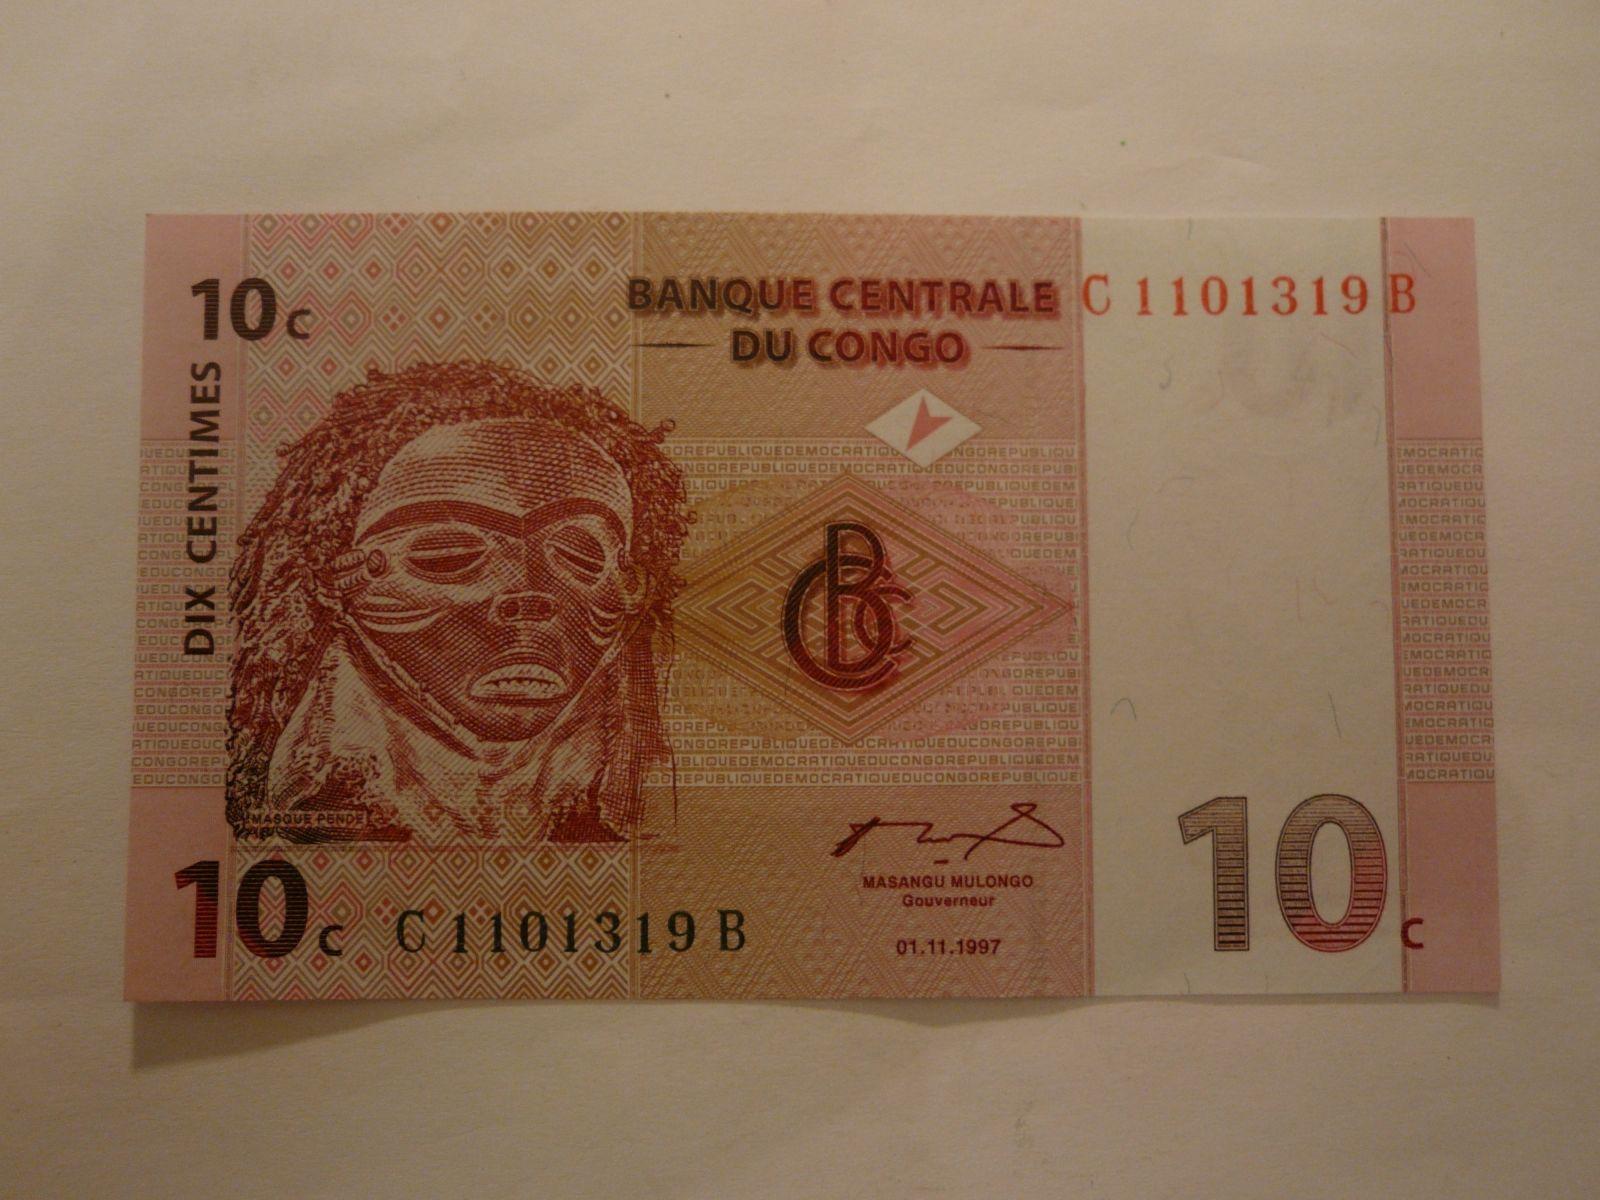 10 Cent, 1997, Kongo